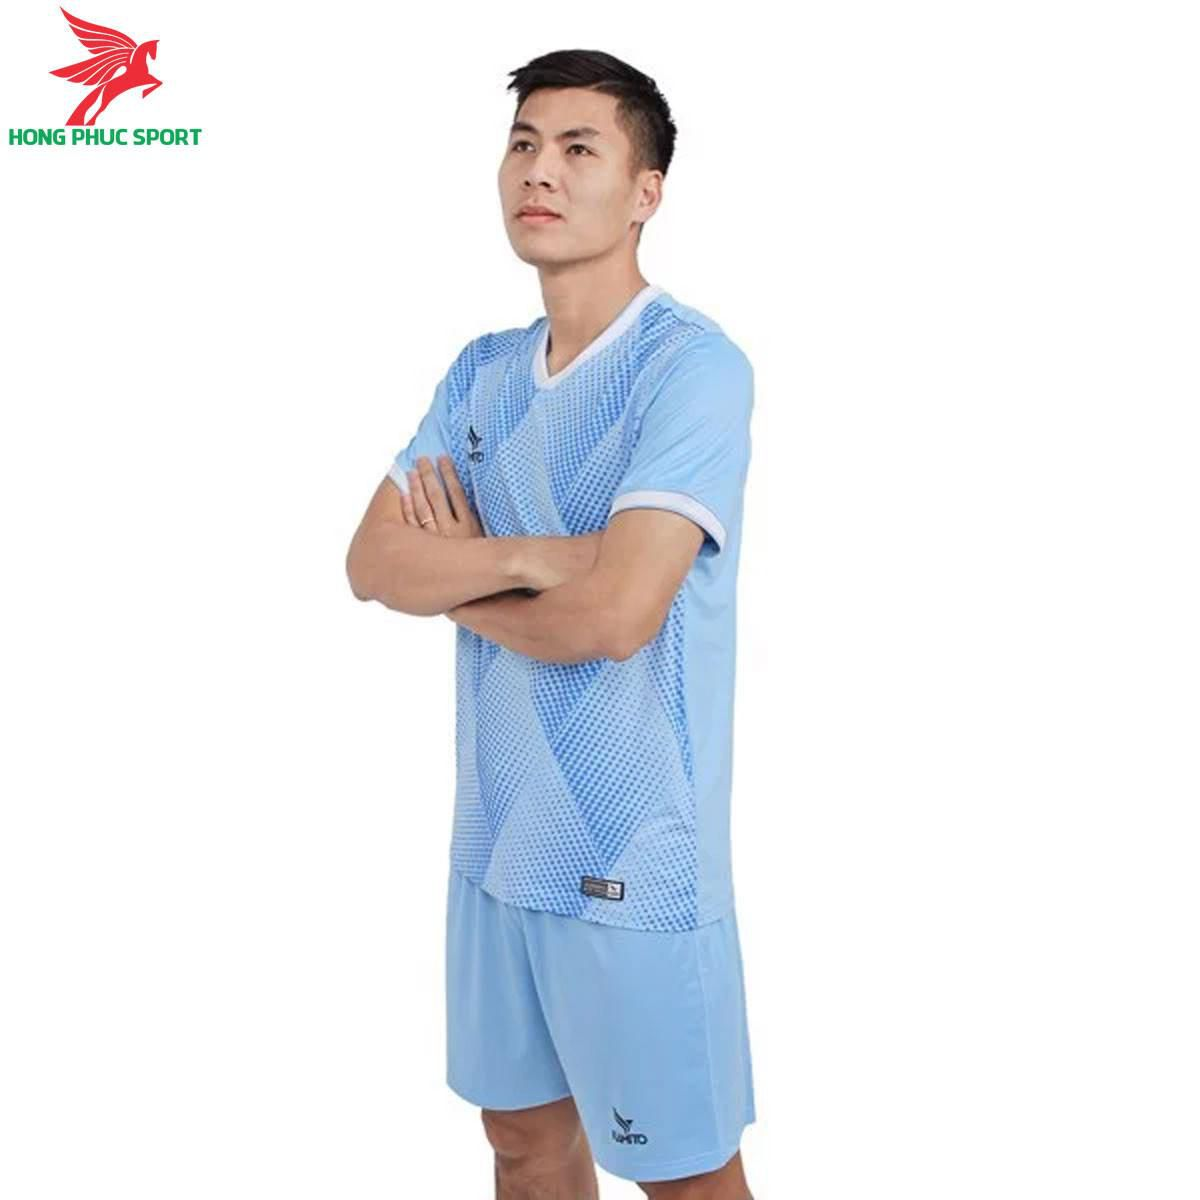 https://cdn.hongphucsport.com/unsafe/s4.shopbay.vn/files/285/ao-khong-logo-kamito-msh2101-mau-xanh-bien-4-6052dc07846d5.jpg